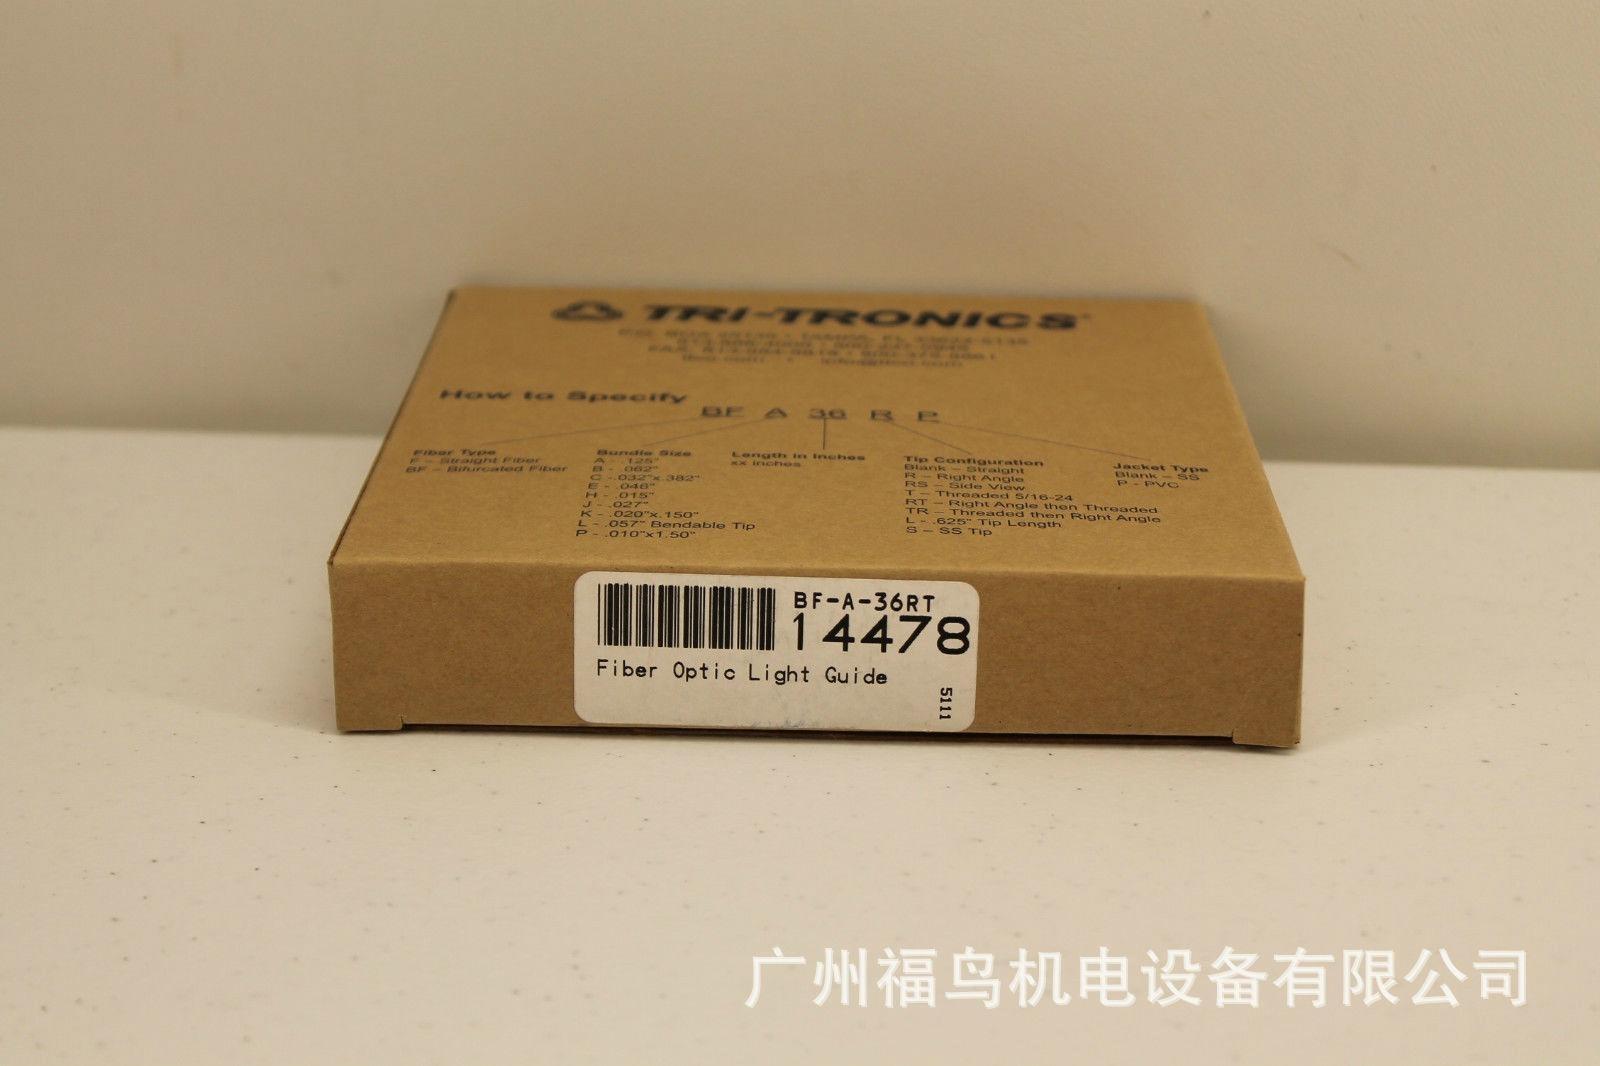 TRI-TRONICS光纖, 型號: BF-A-36RT